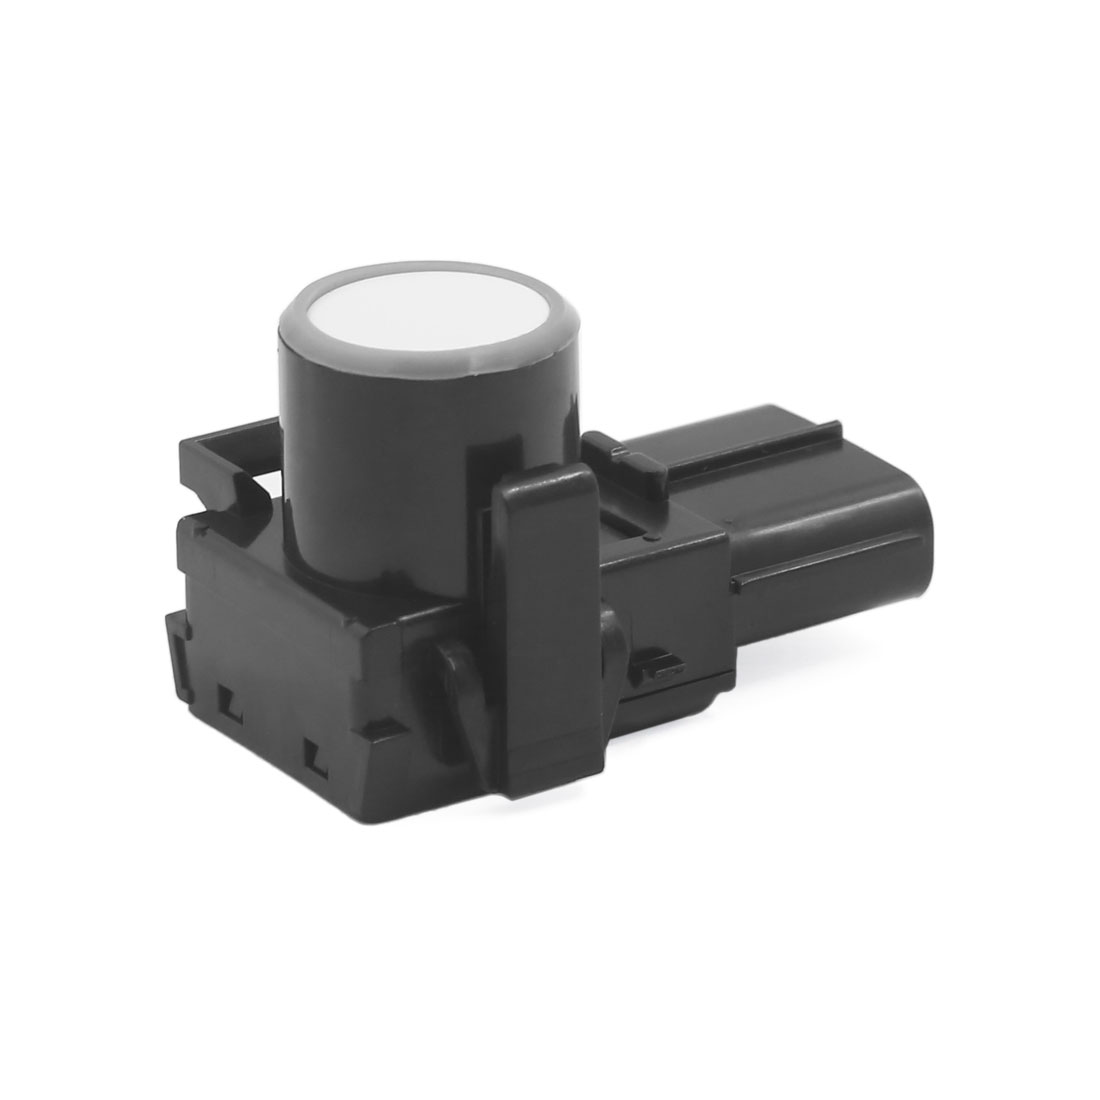 Reverse Parking Sensor 89341-48010 for Lexus GX460 RX350 RX450H Toyota Camry